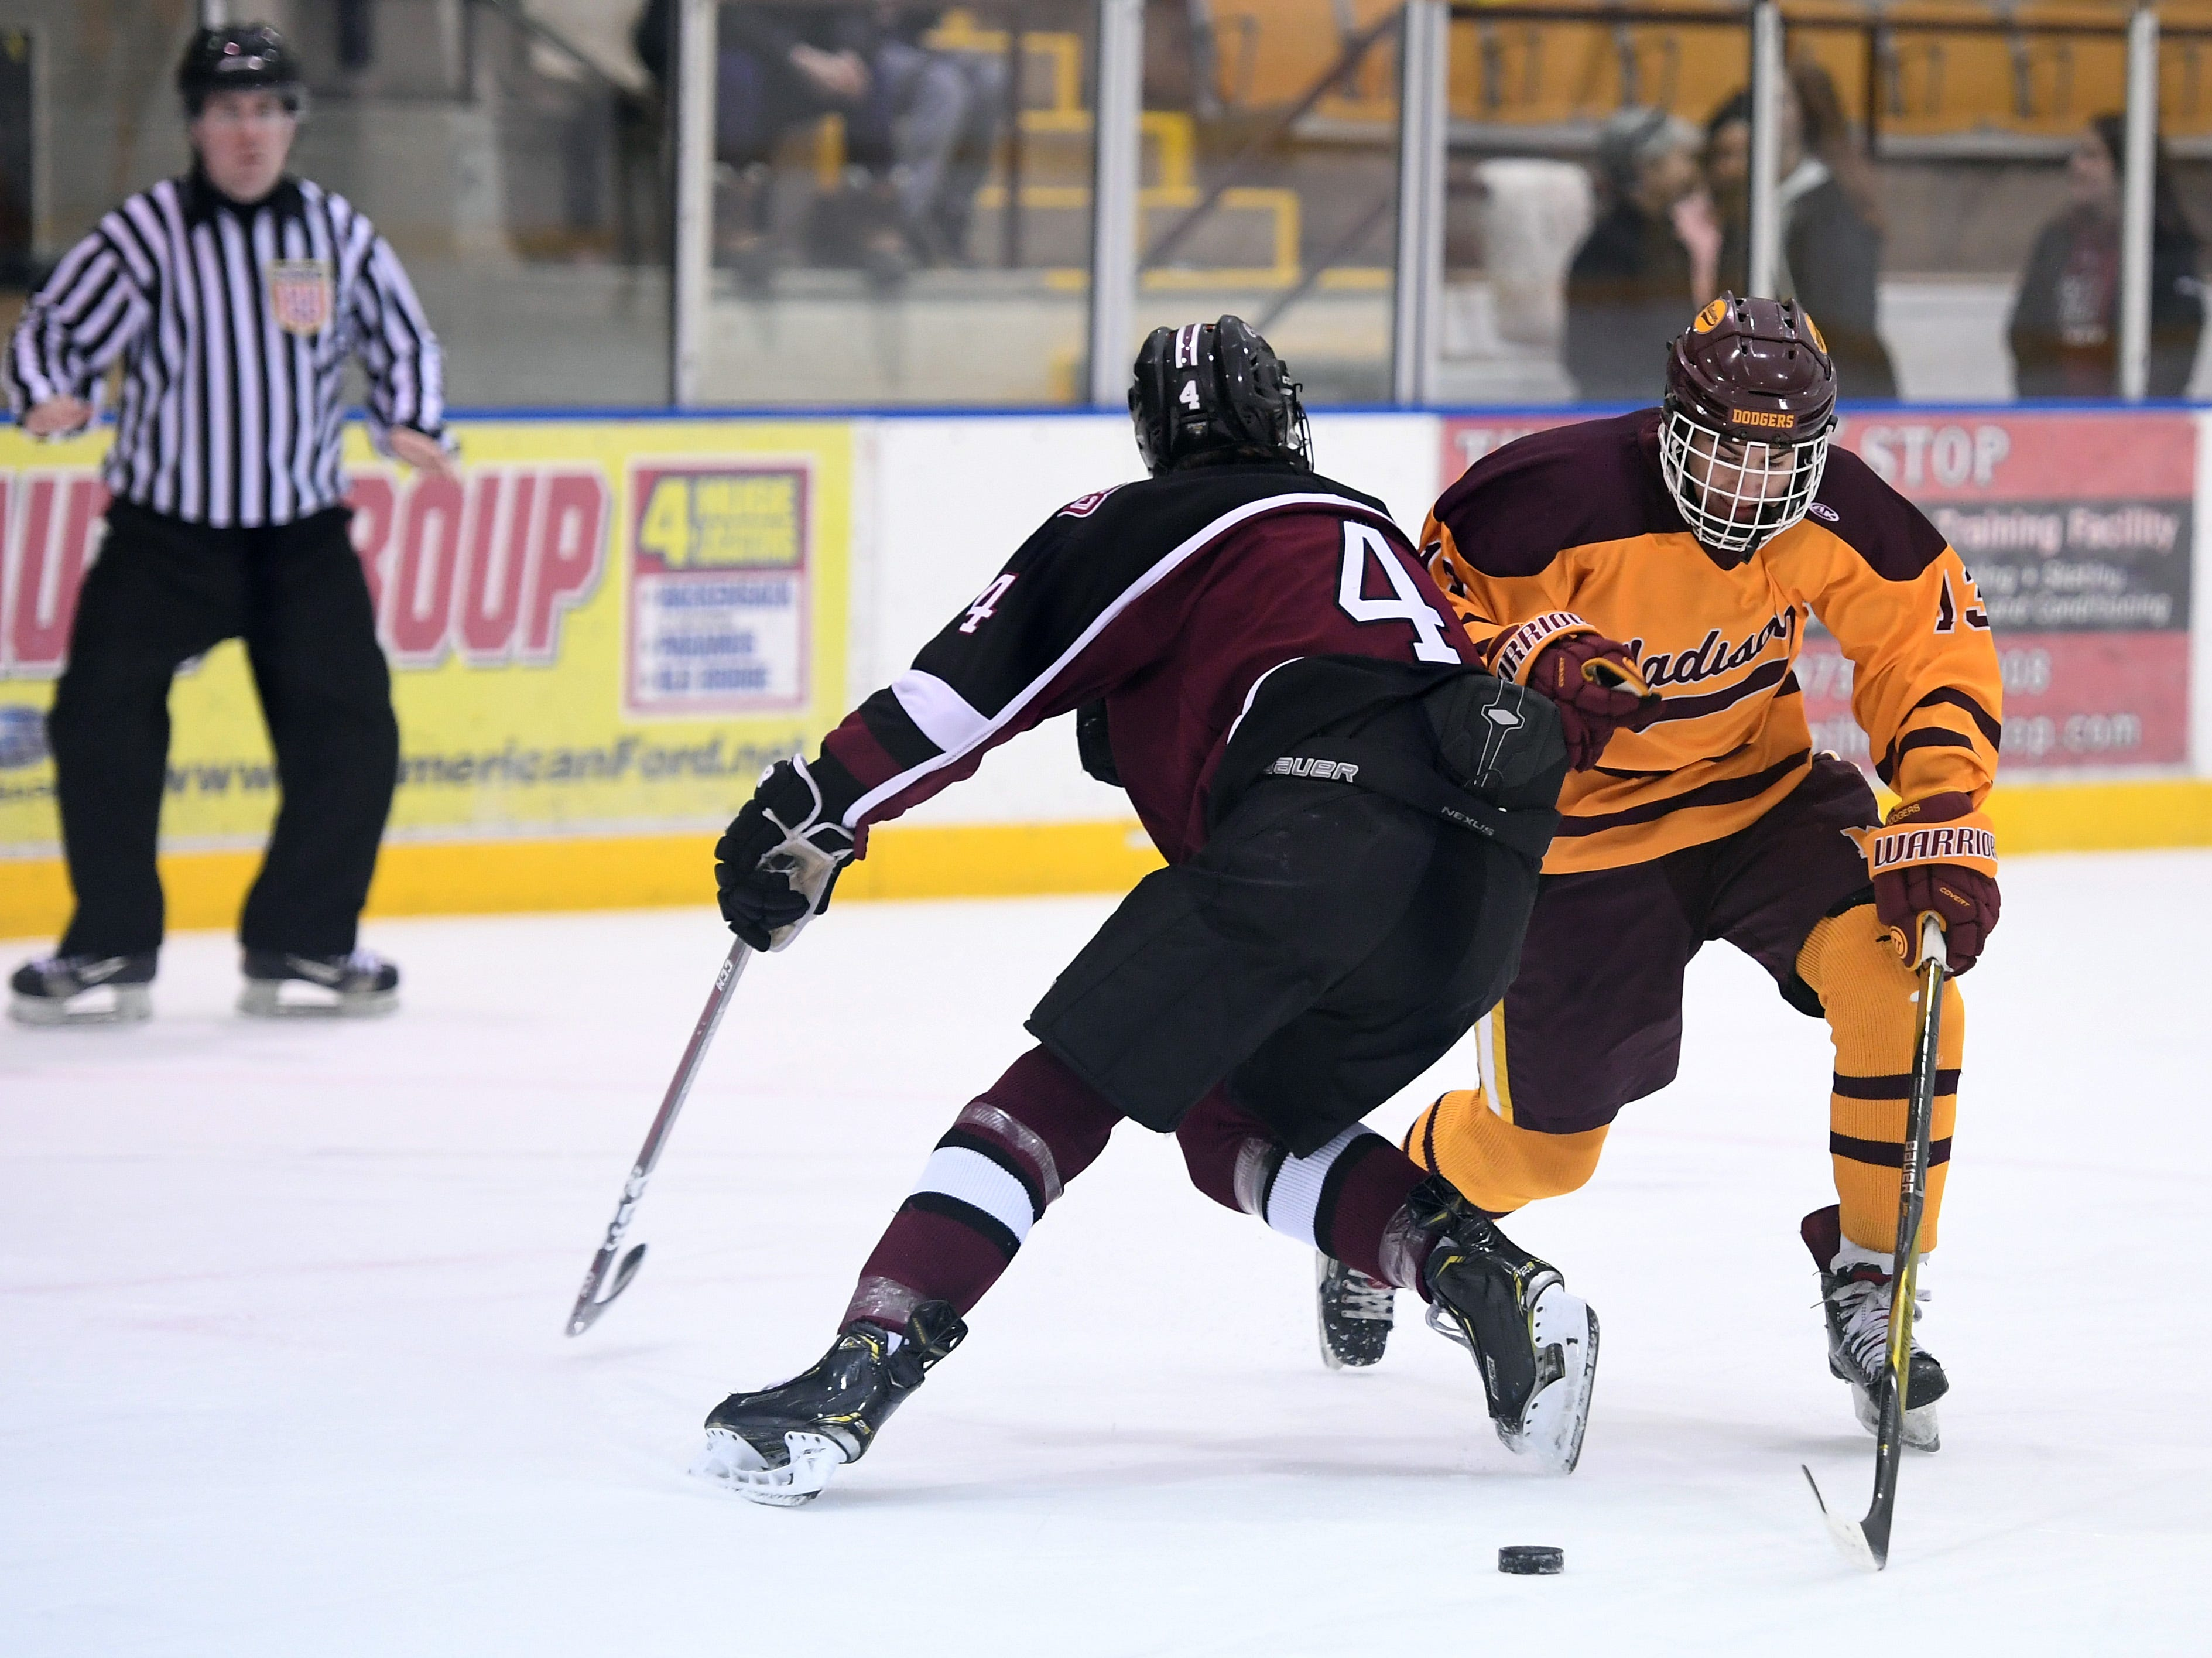 Madison ice hockey vs. Morristown-Beard at Mennen Sports Arena on Thursday, December 20, 2018. Madison #13 Dave Renzulli works to get past Morristown-Beard #4 Billy Moloney.